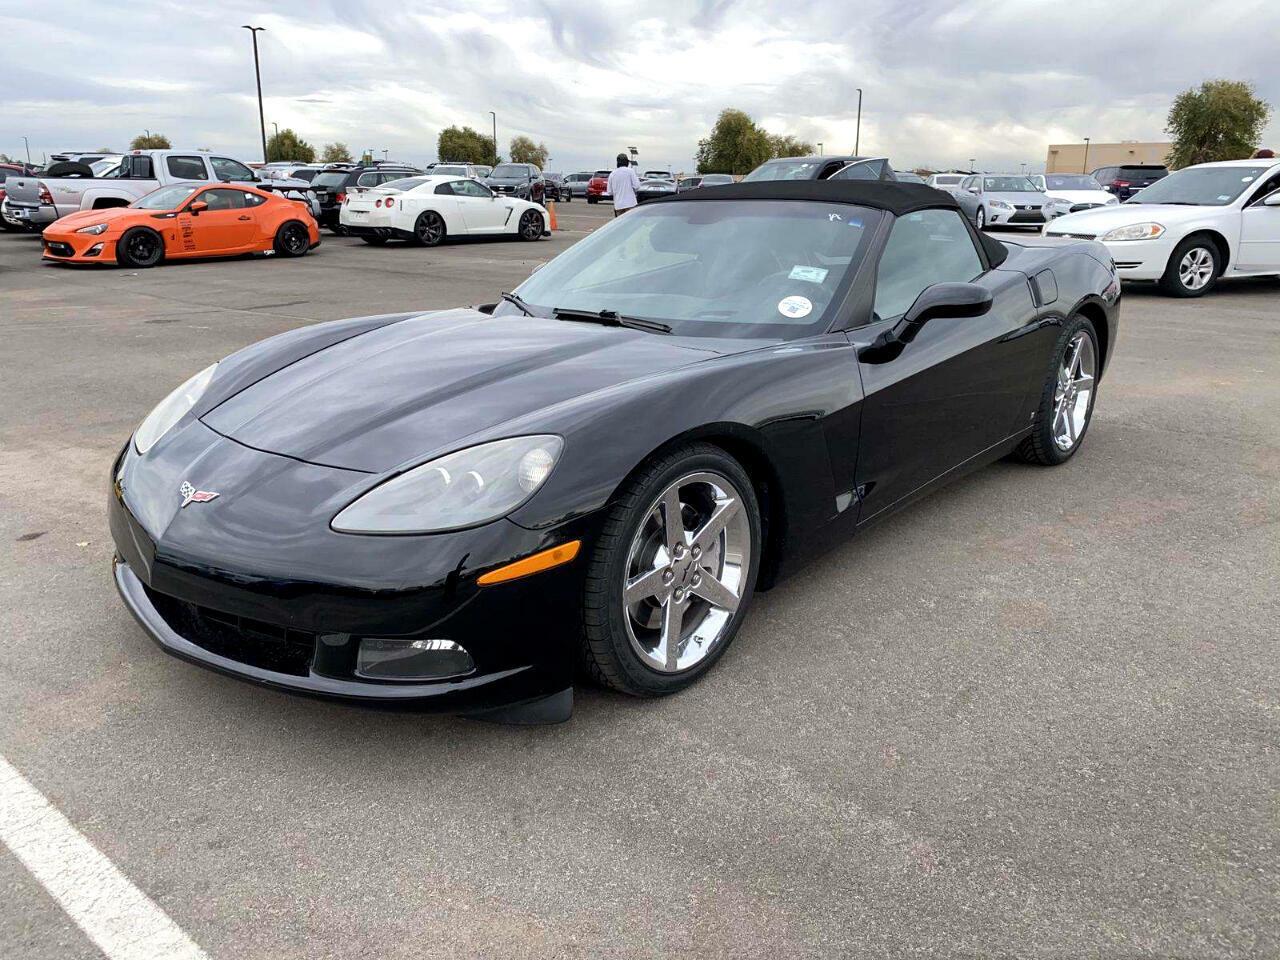 2007 Black Chevrolet Corvette Convertible    C6 Corvette Photo 10